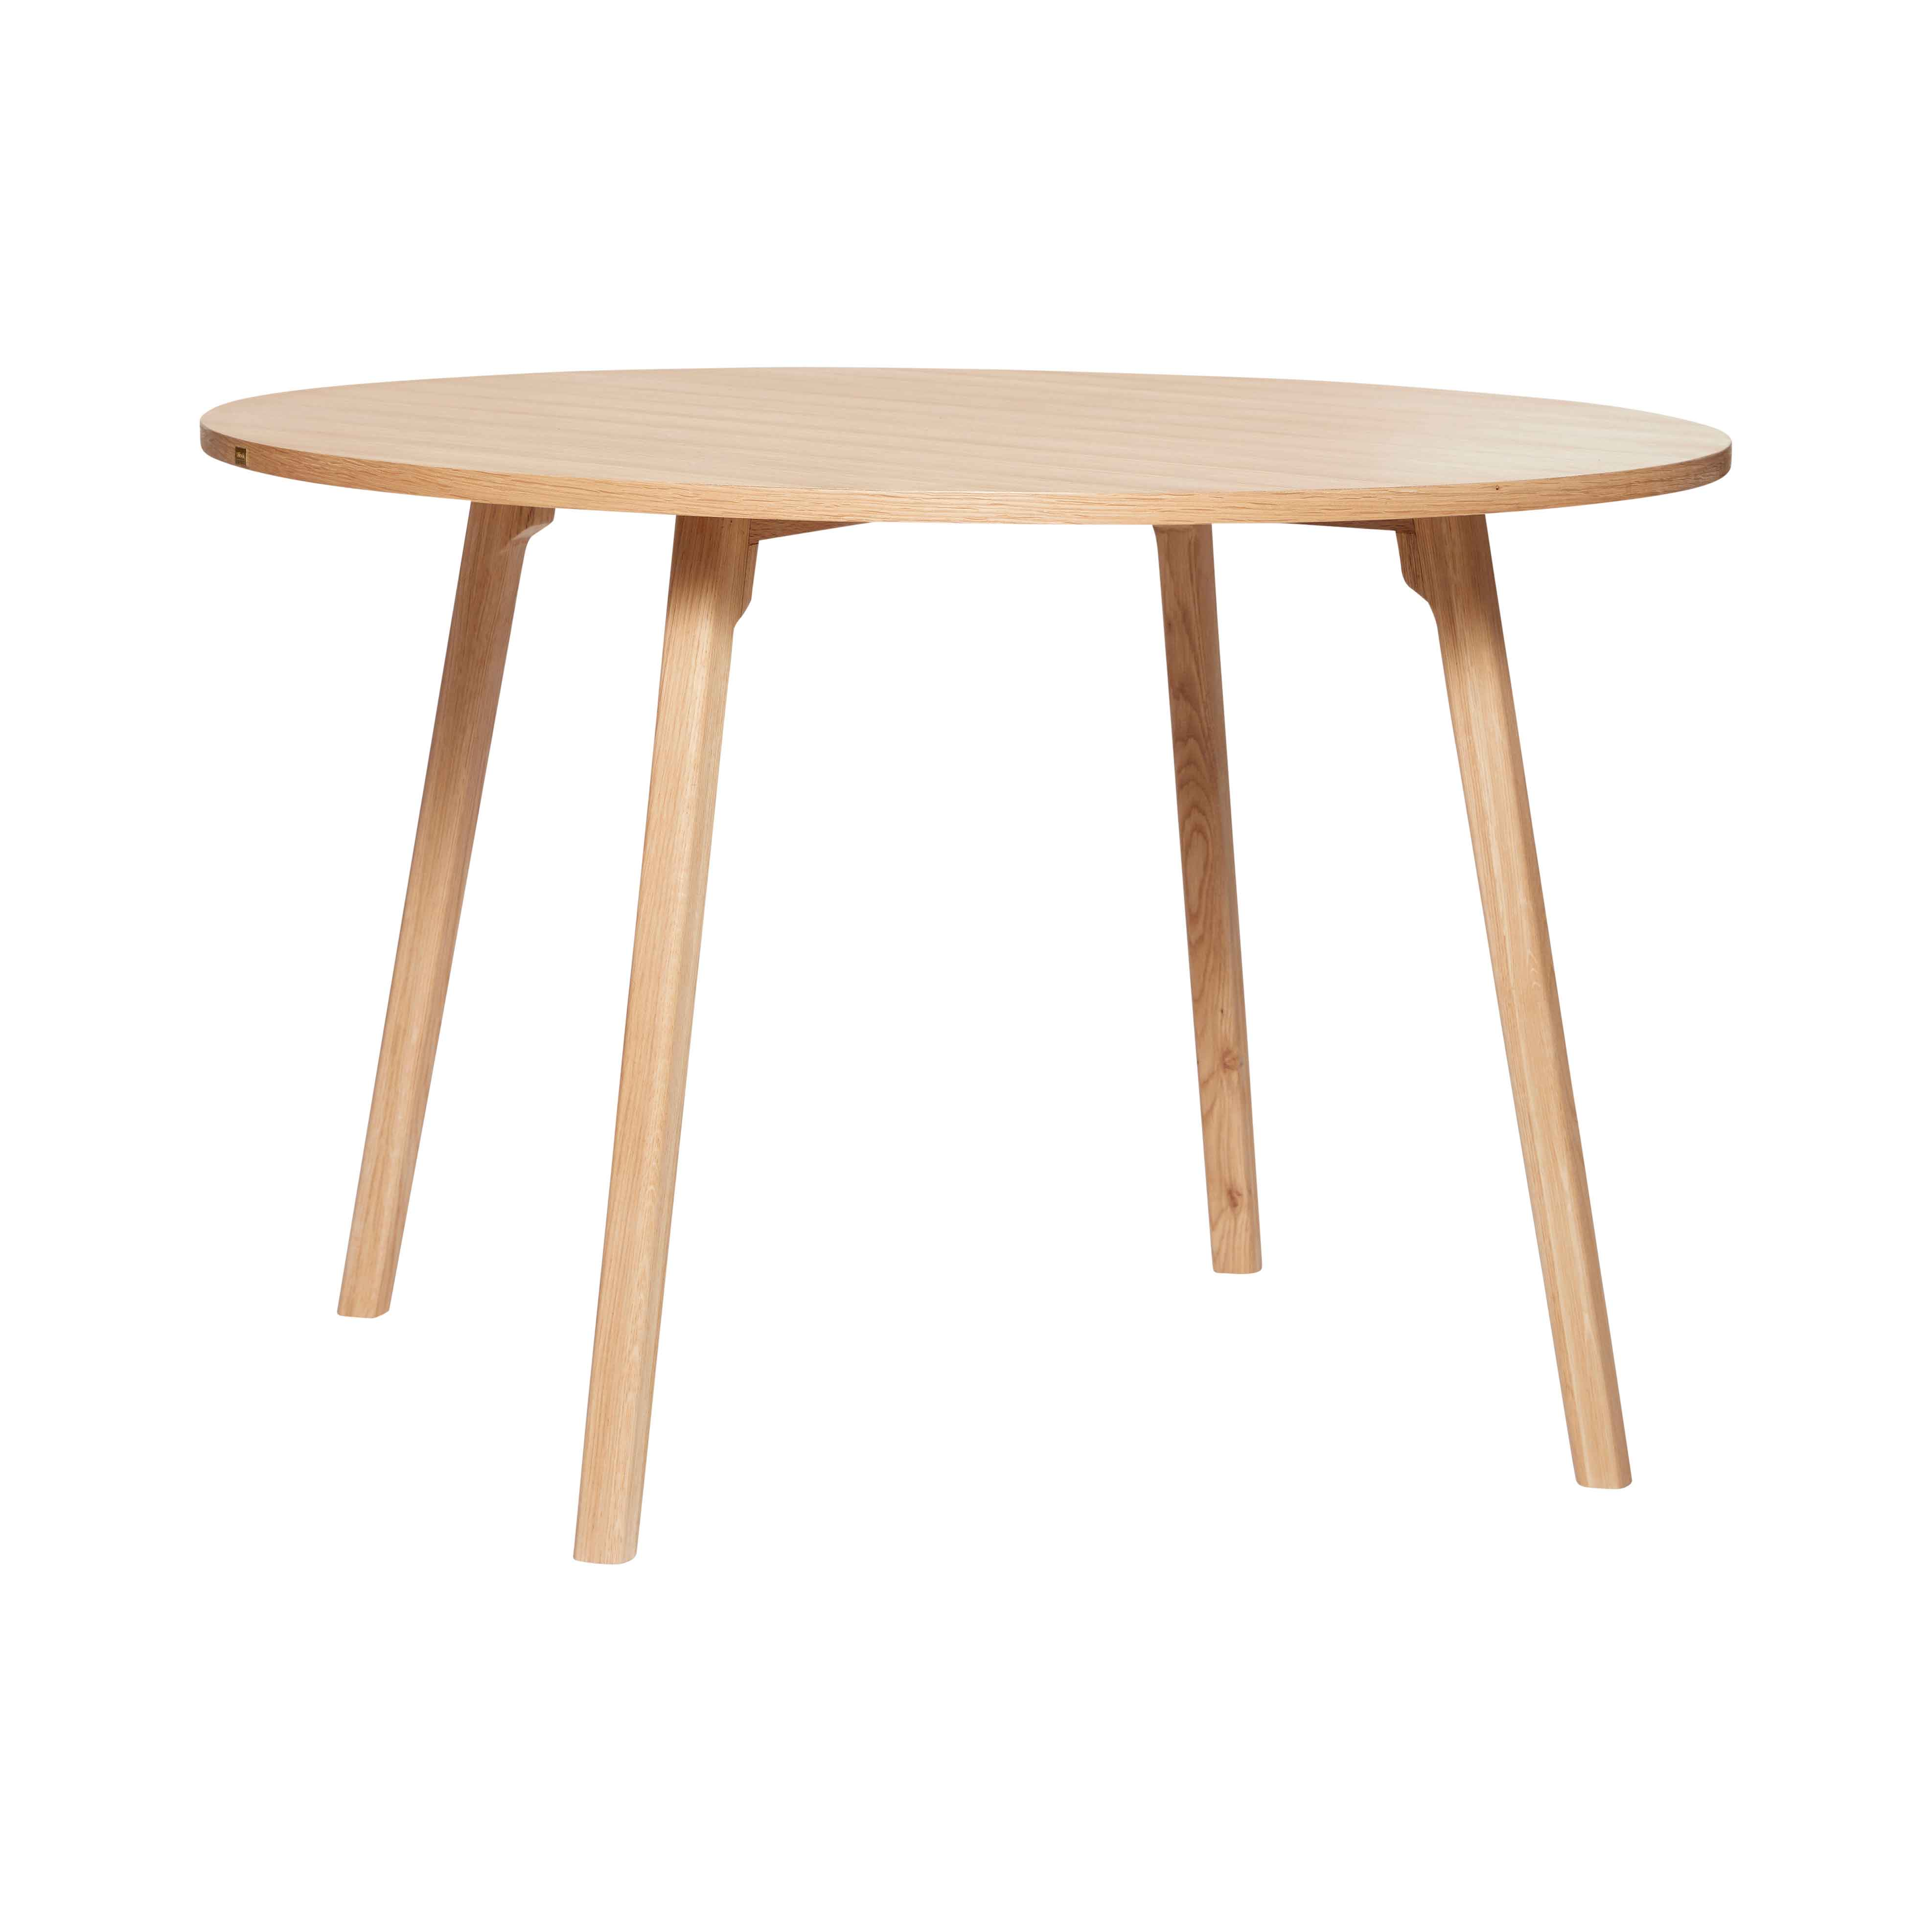 hübsch H?bsch rund spisebord - egetræ, finer (ø:115cm) fra boboonline.dk